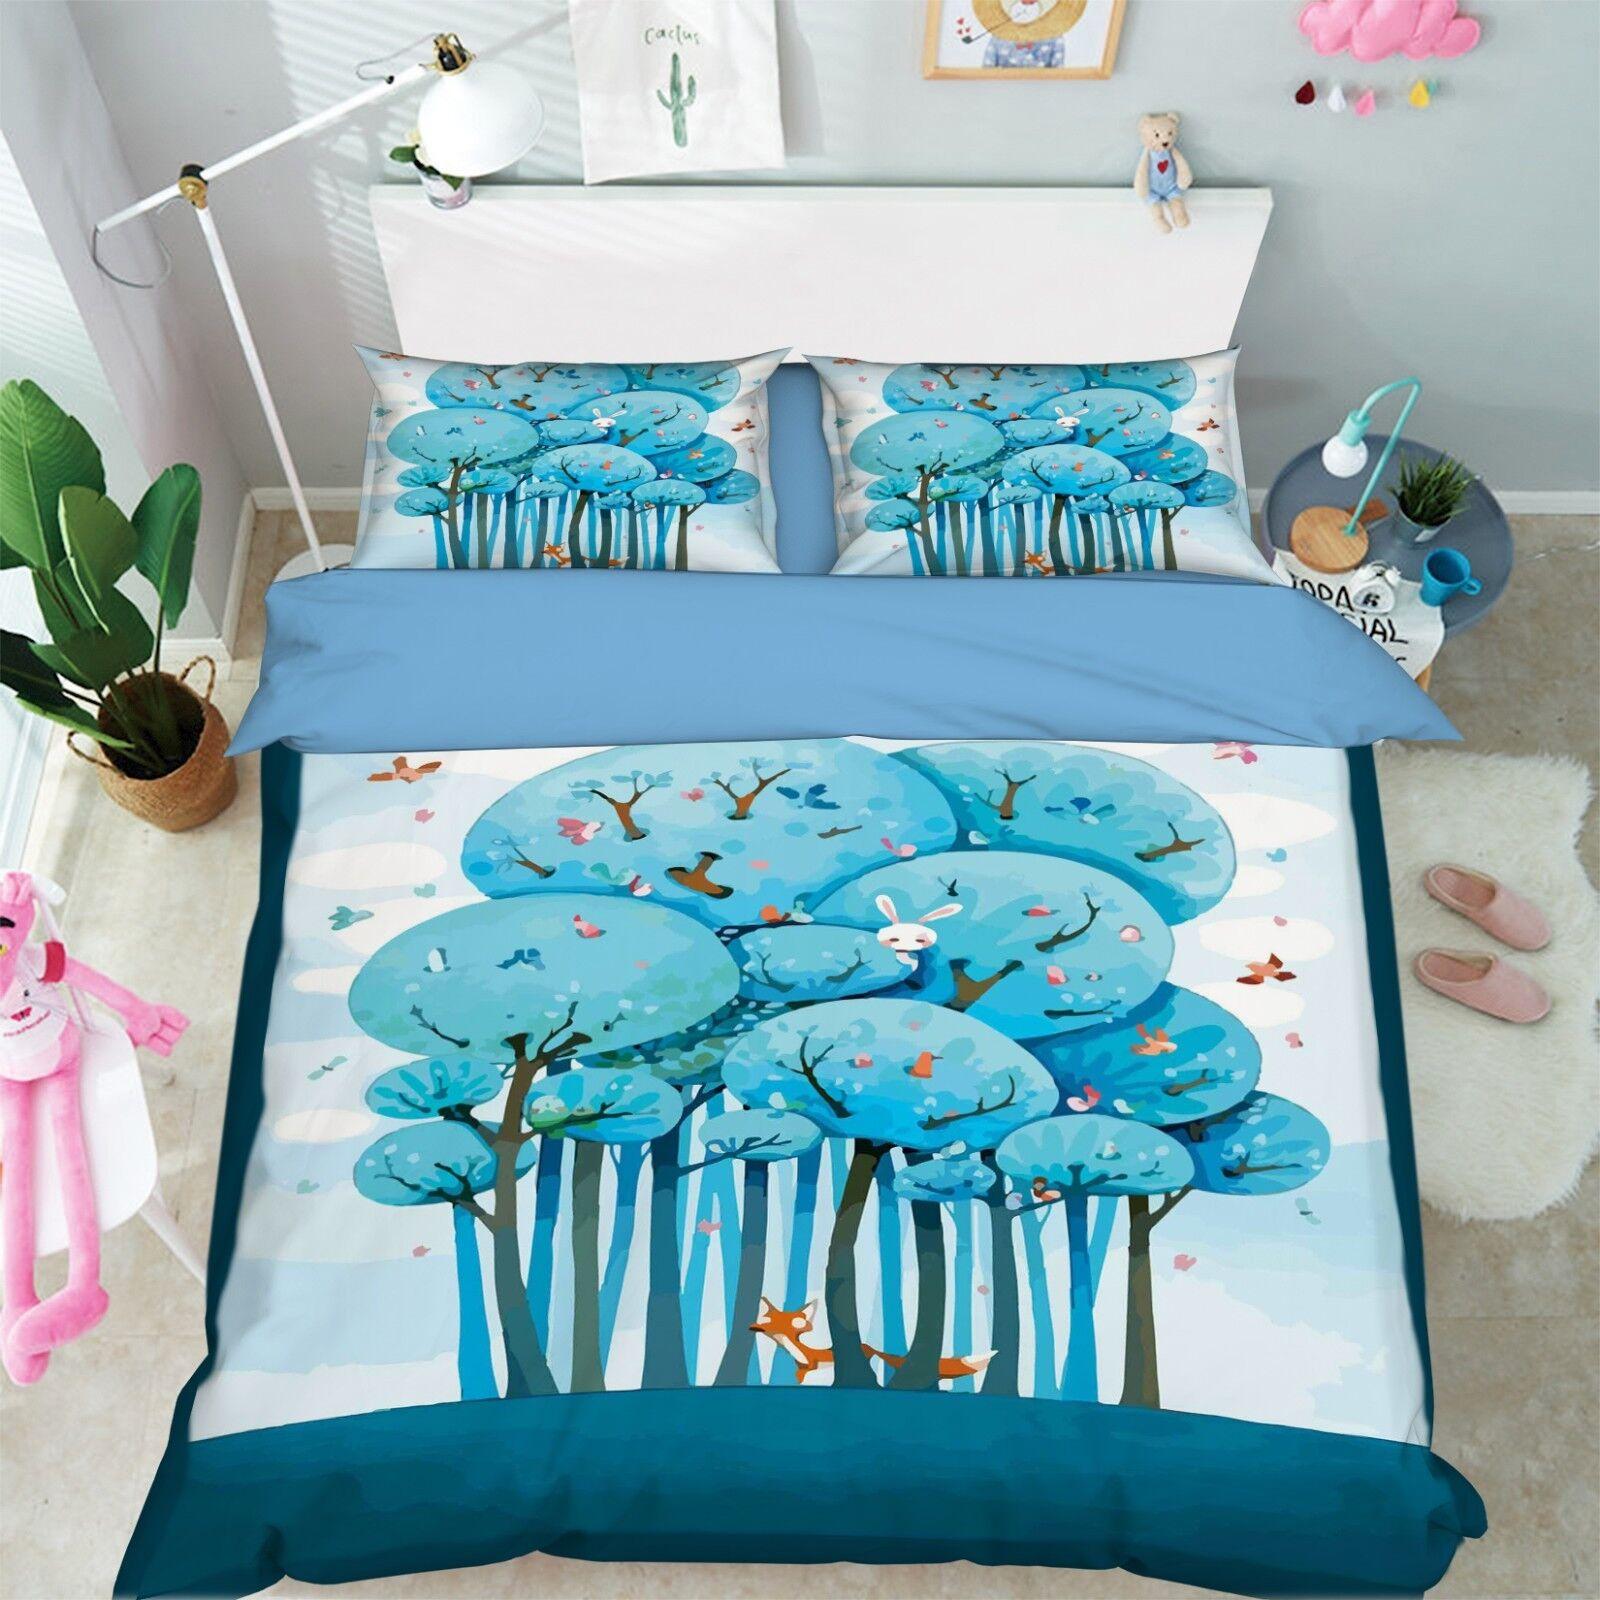 3D Forest Animal 6 Bed Pillowcases Quilt Duvet Cover Set Single Queen King AU